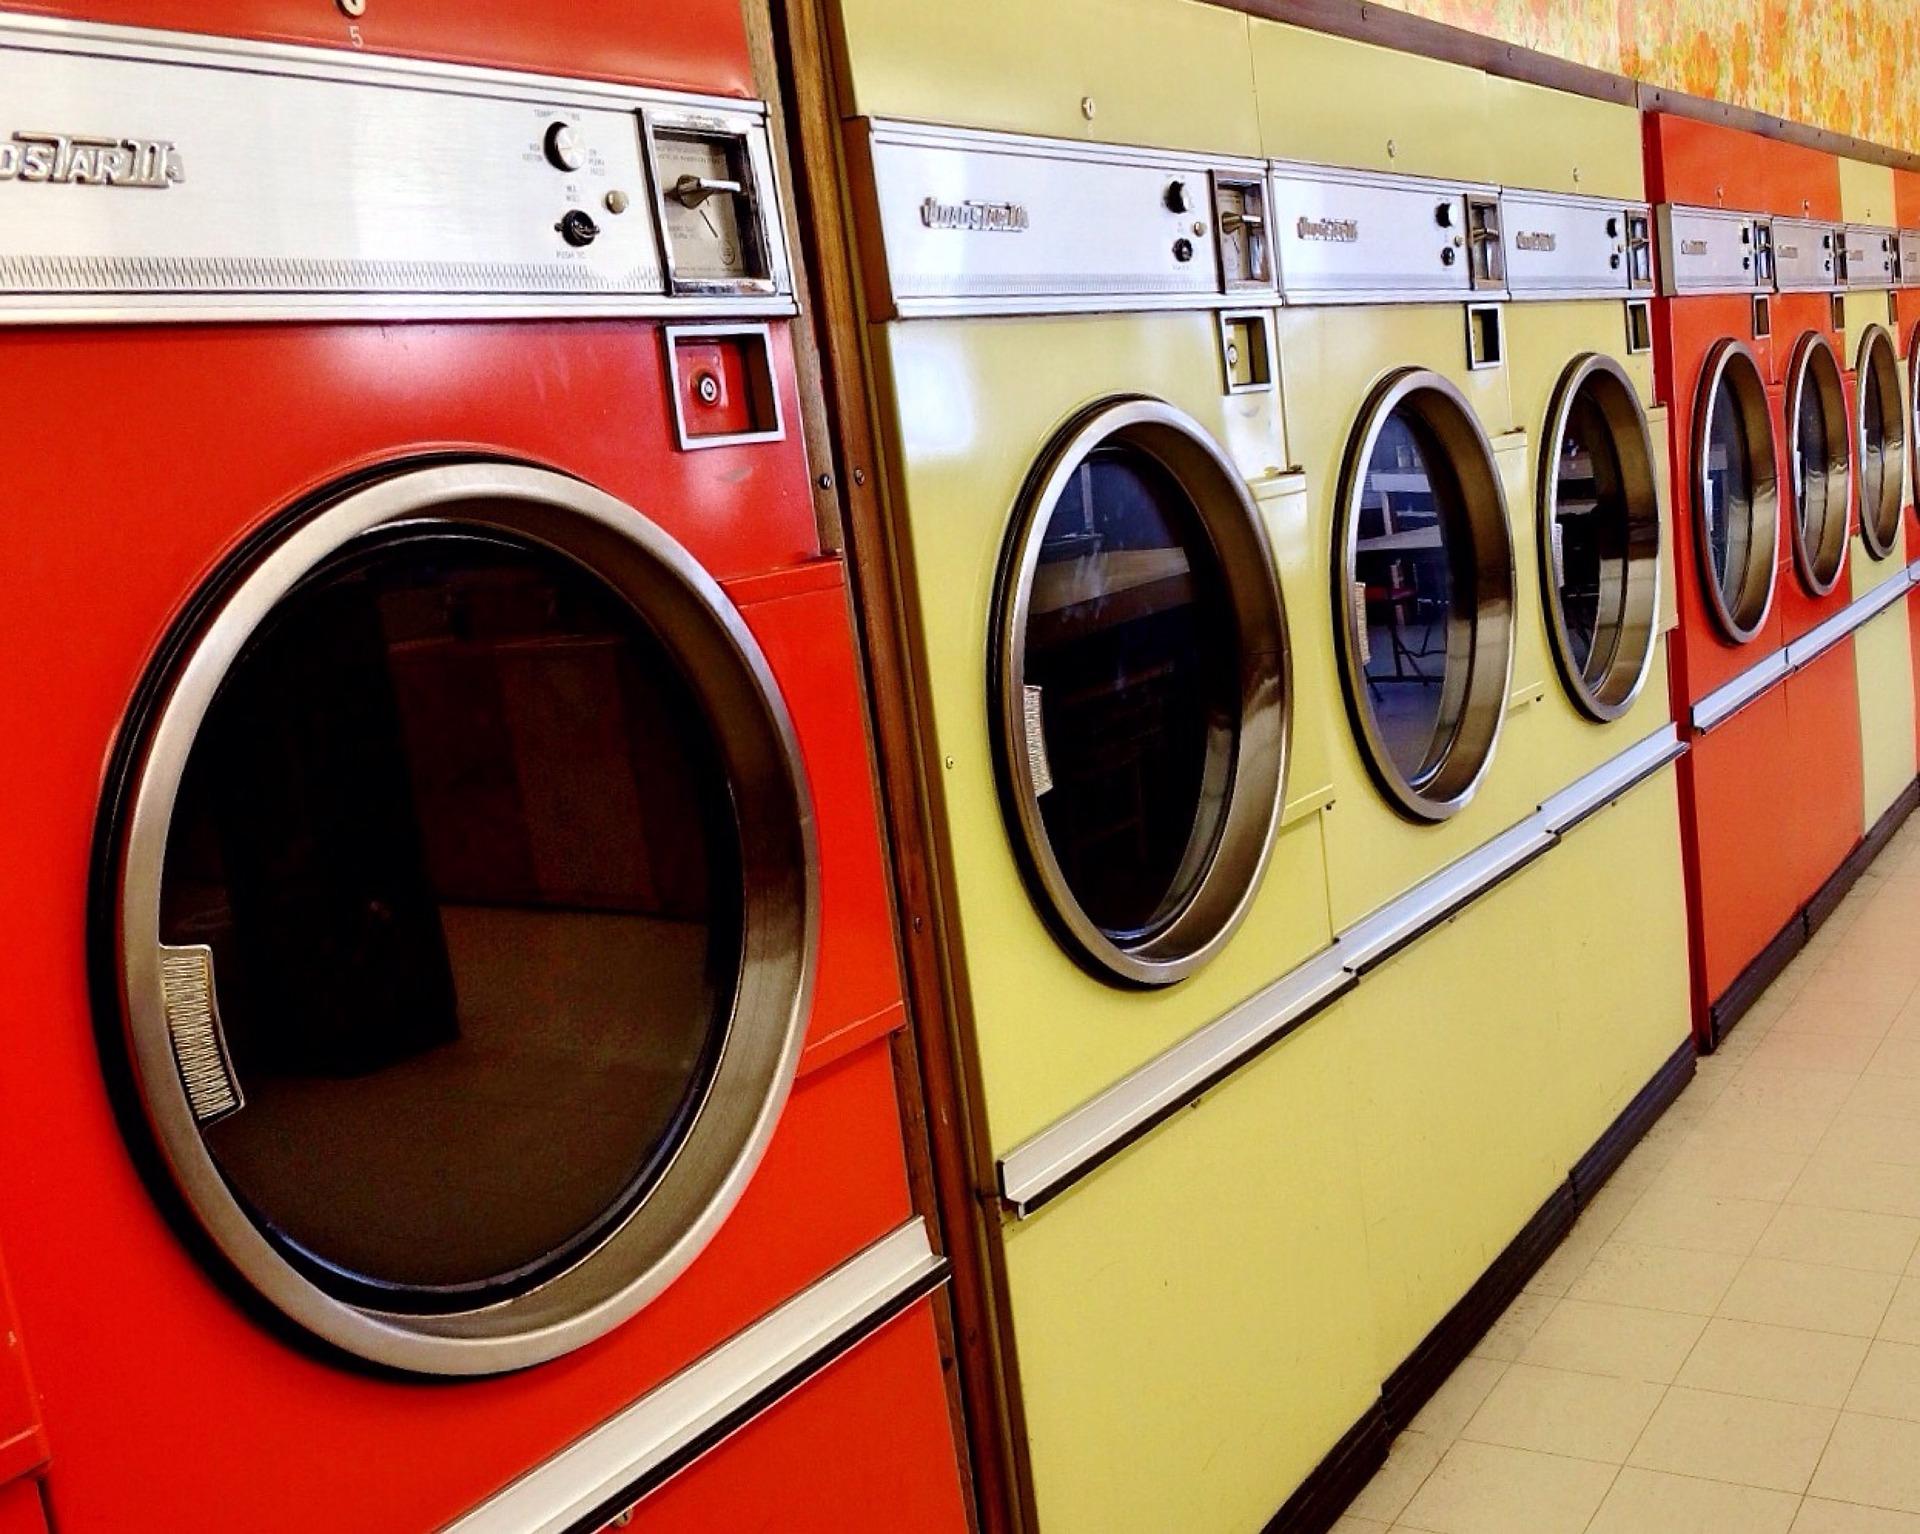 be4e753870da4 ユニクロカシミヤセーターの洗濯方法 洗濯機は縮む?失敗しない洗い方!